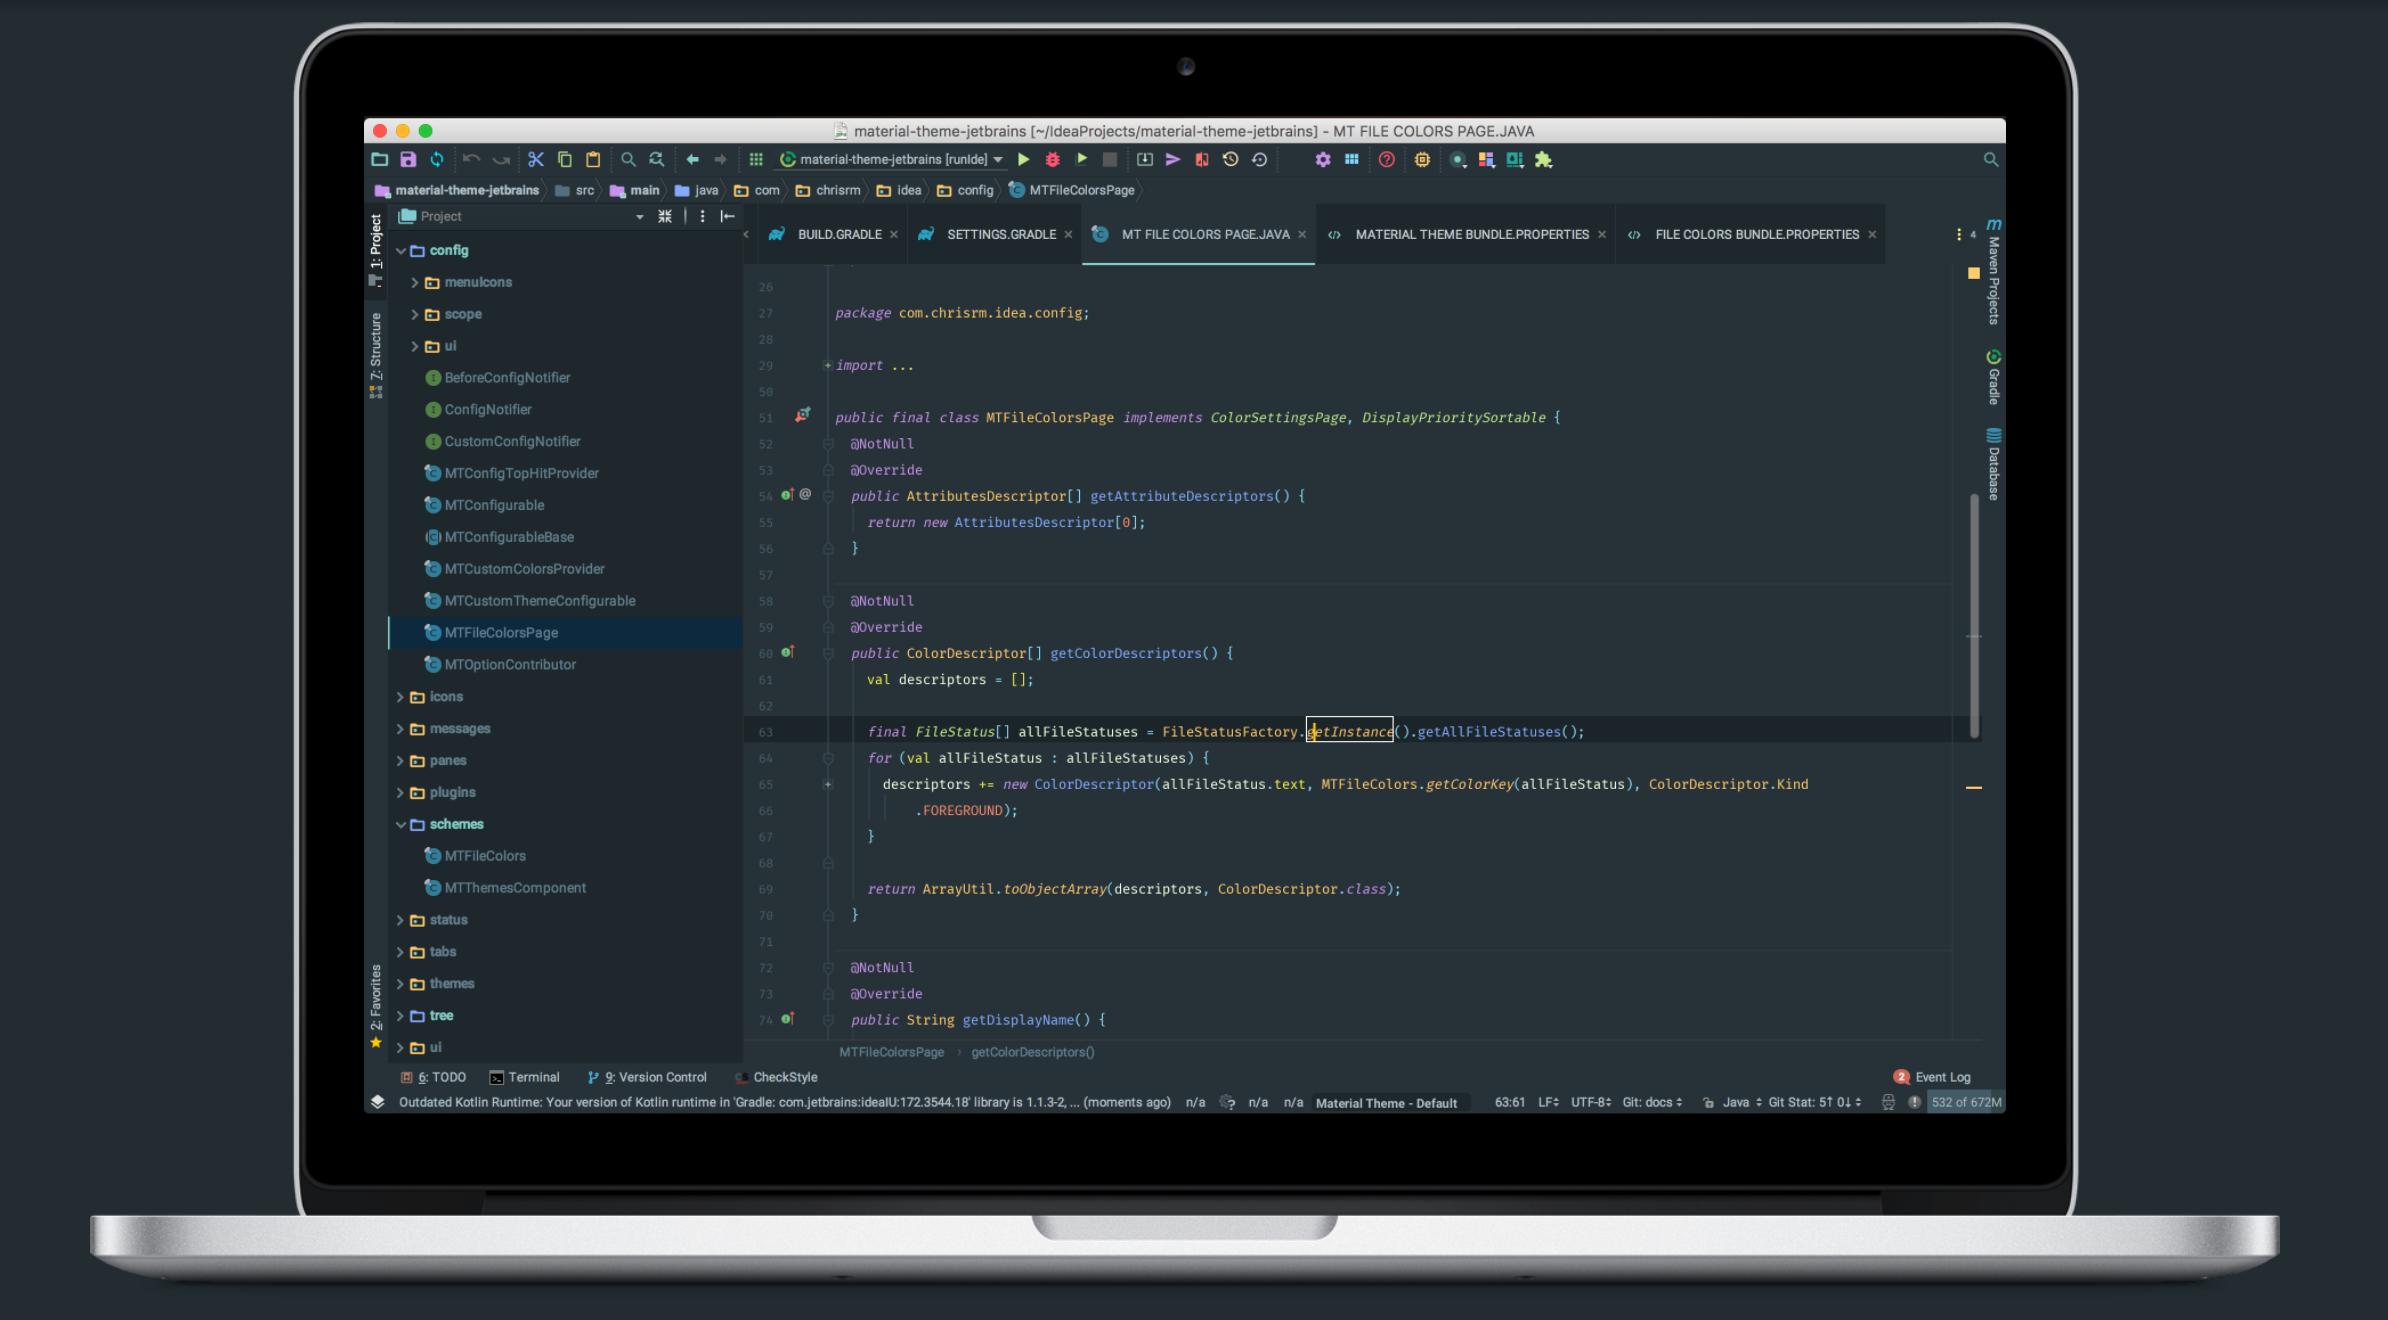 material-theme-jetbrains JetBrains theme of Ma @codeKK AndroidOpen